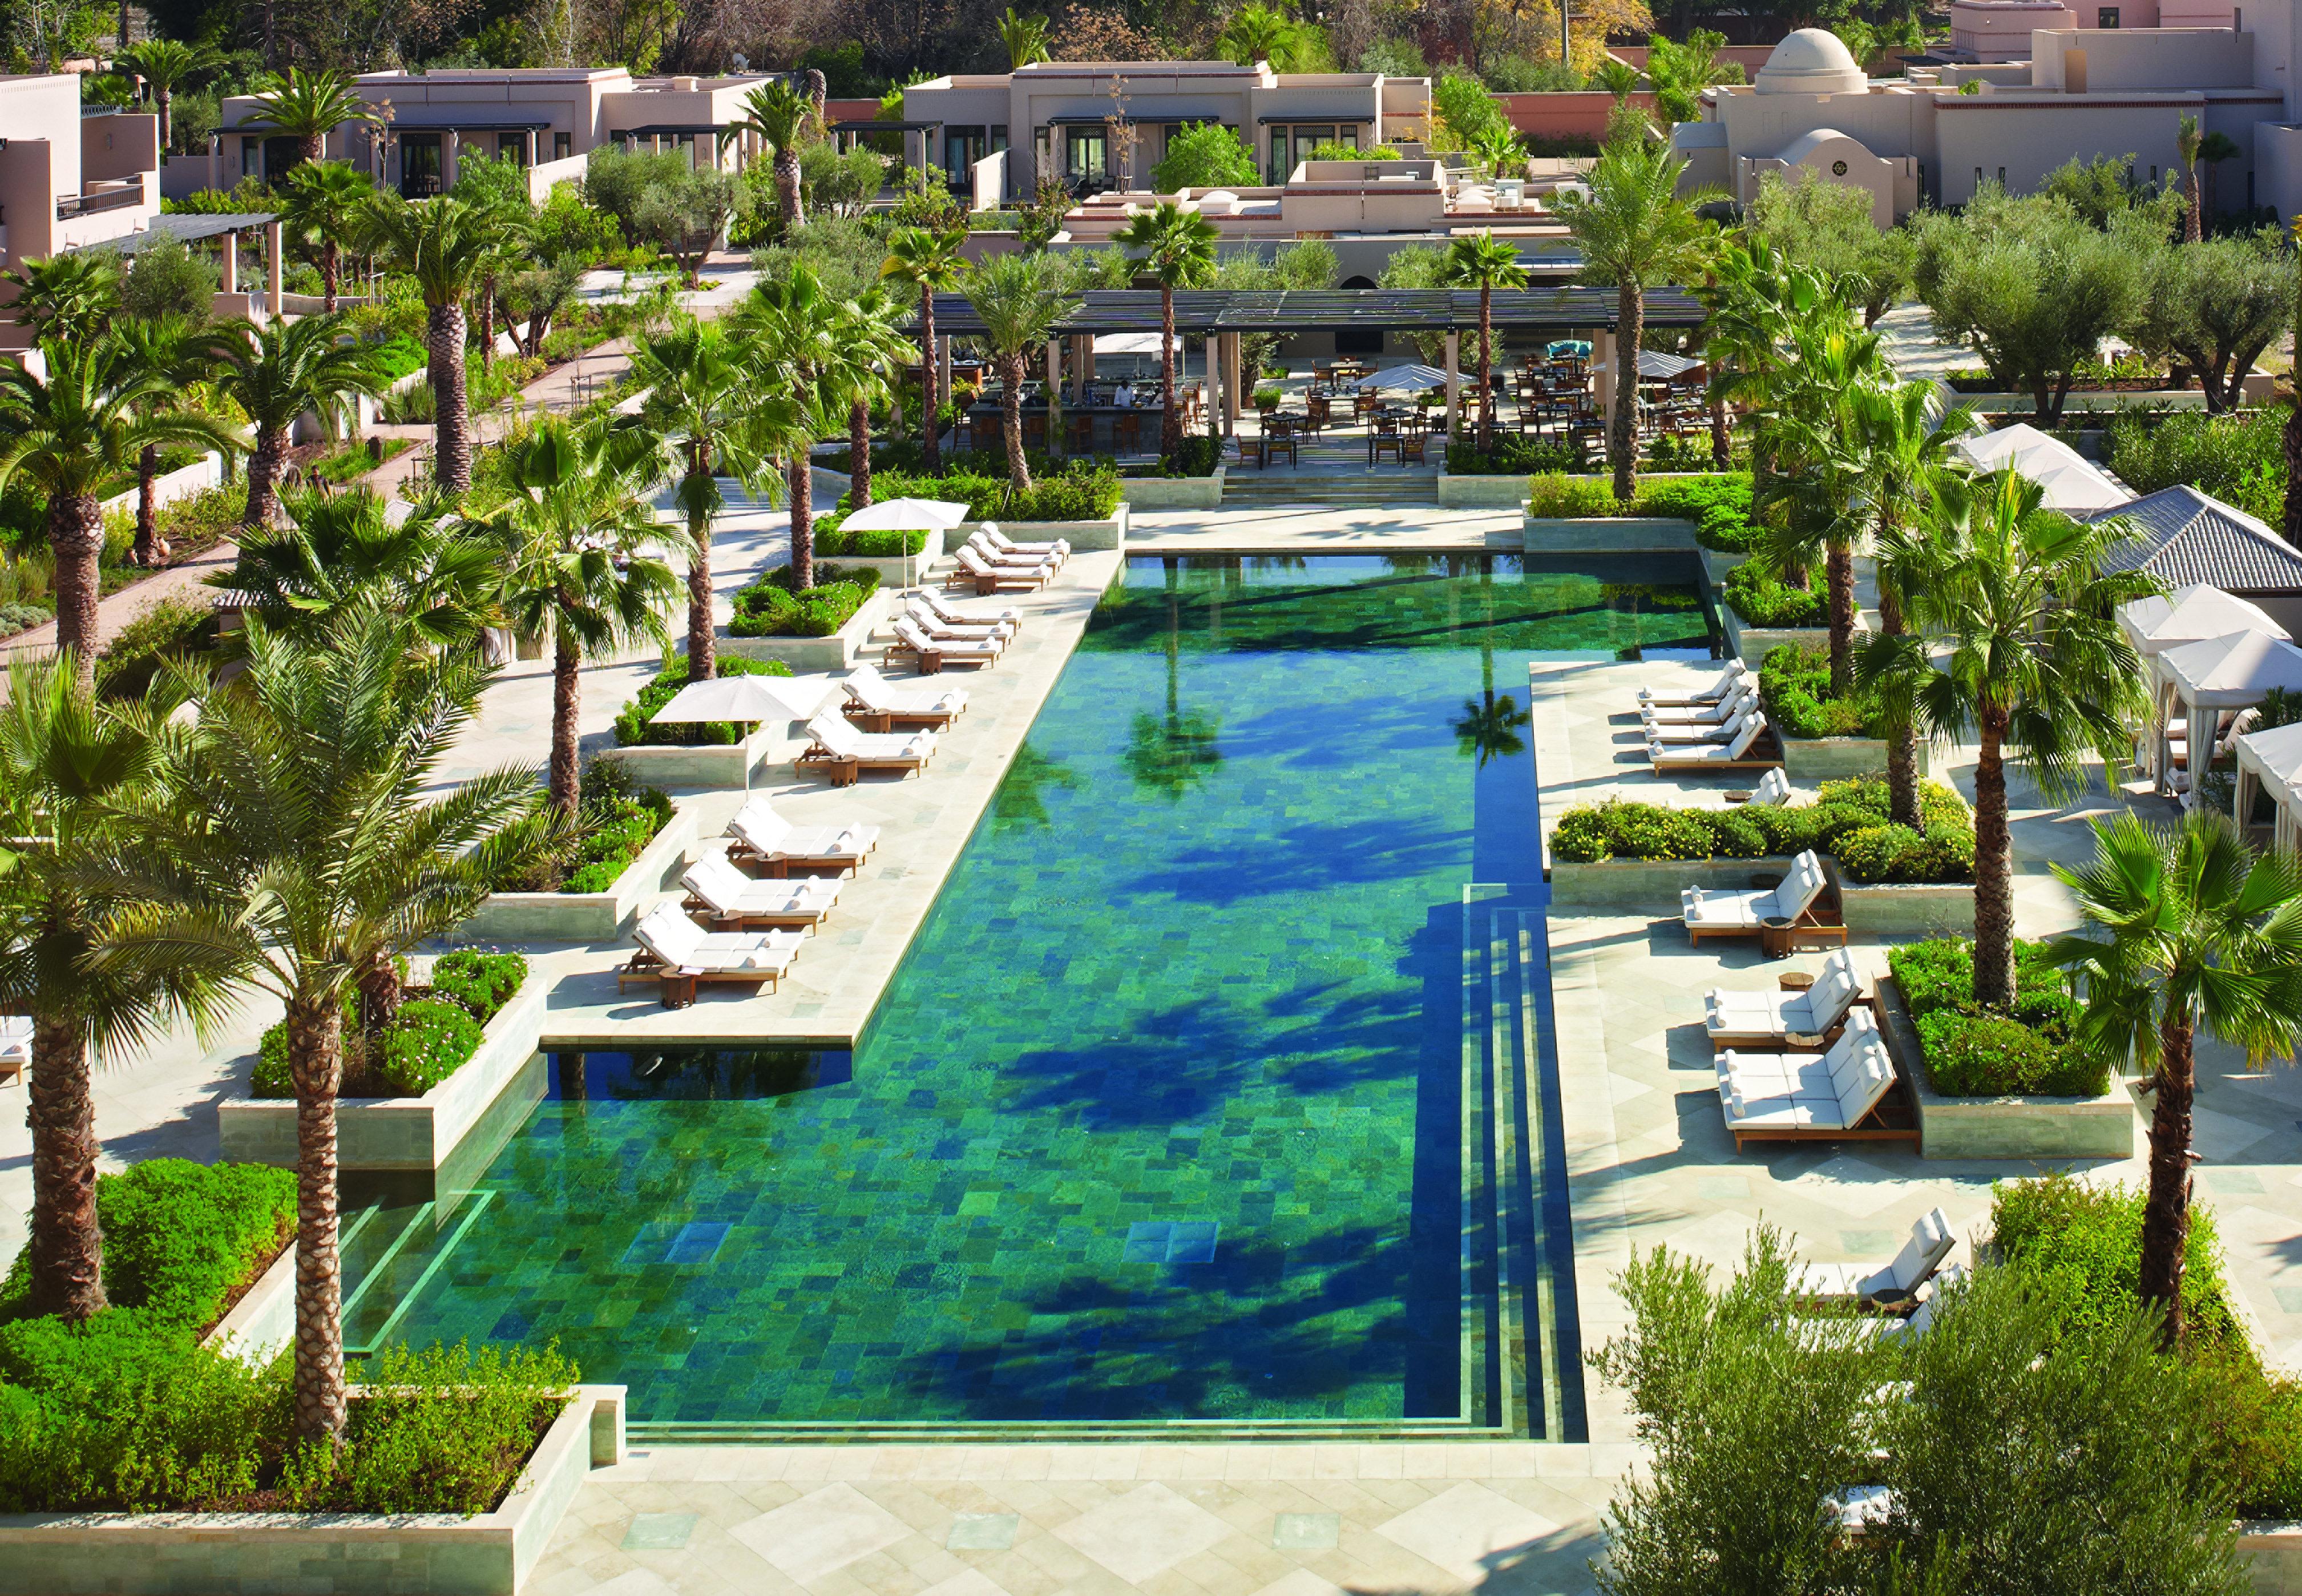 four-seasons-marrakech-pool-oasis